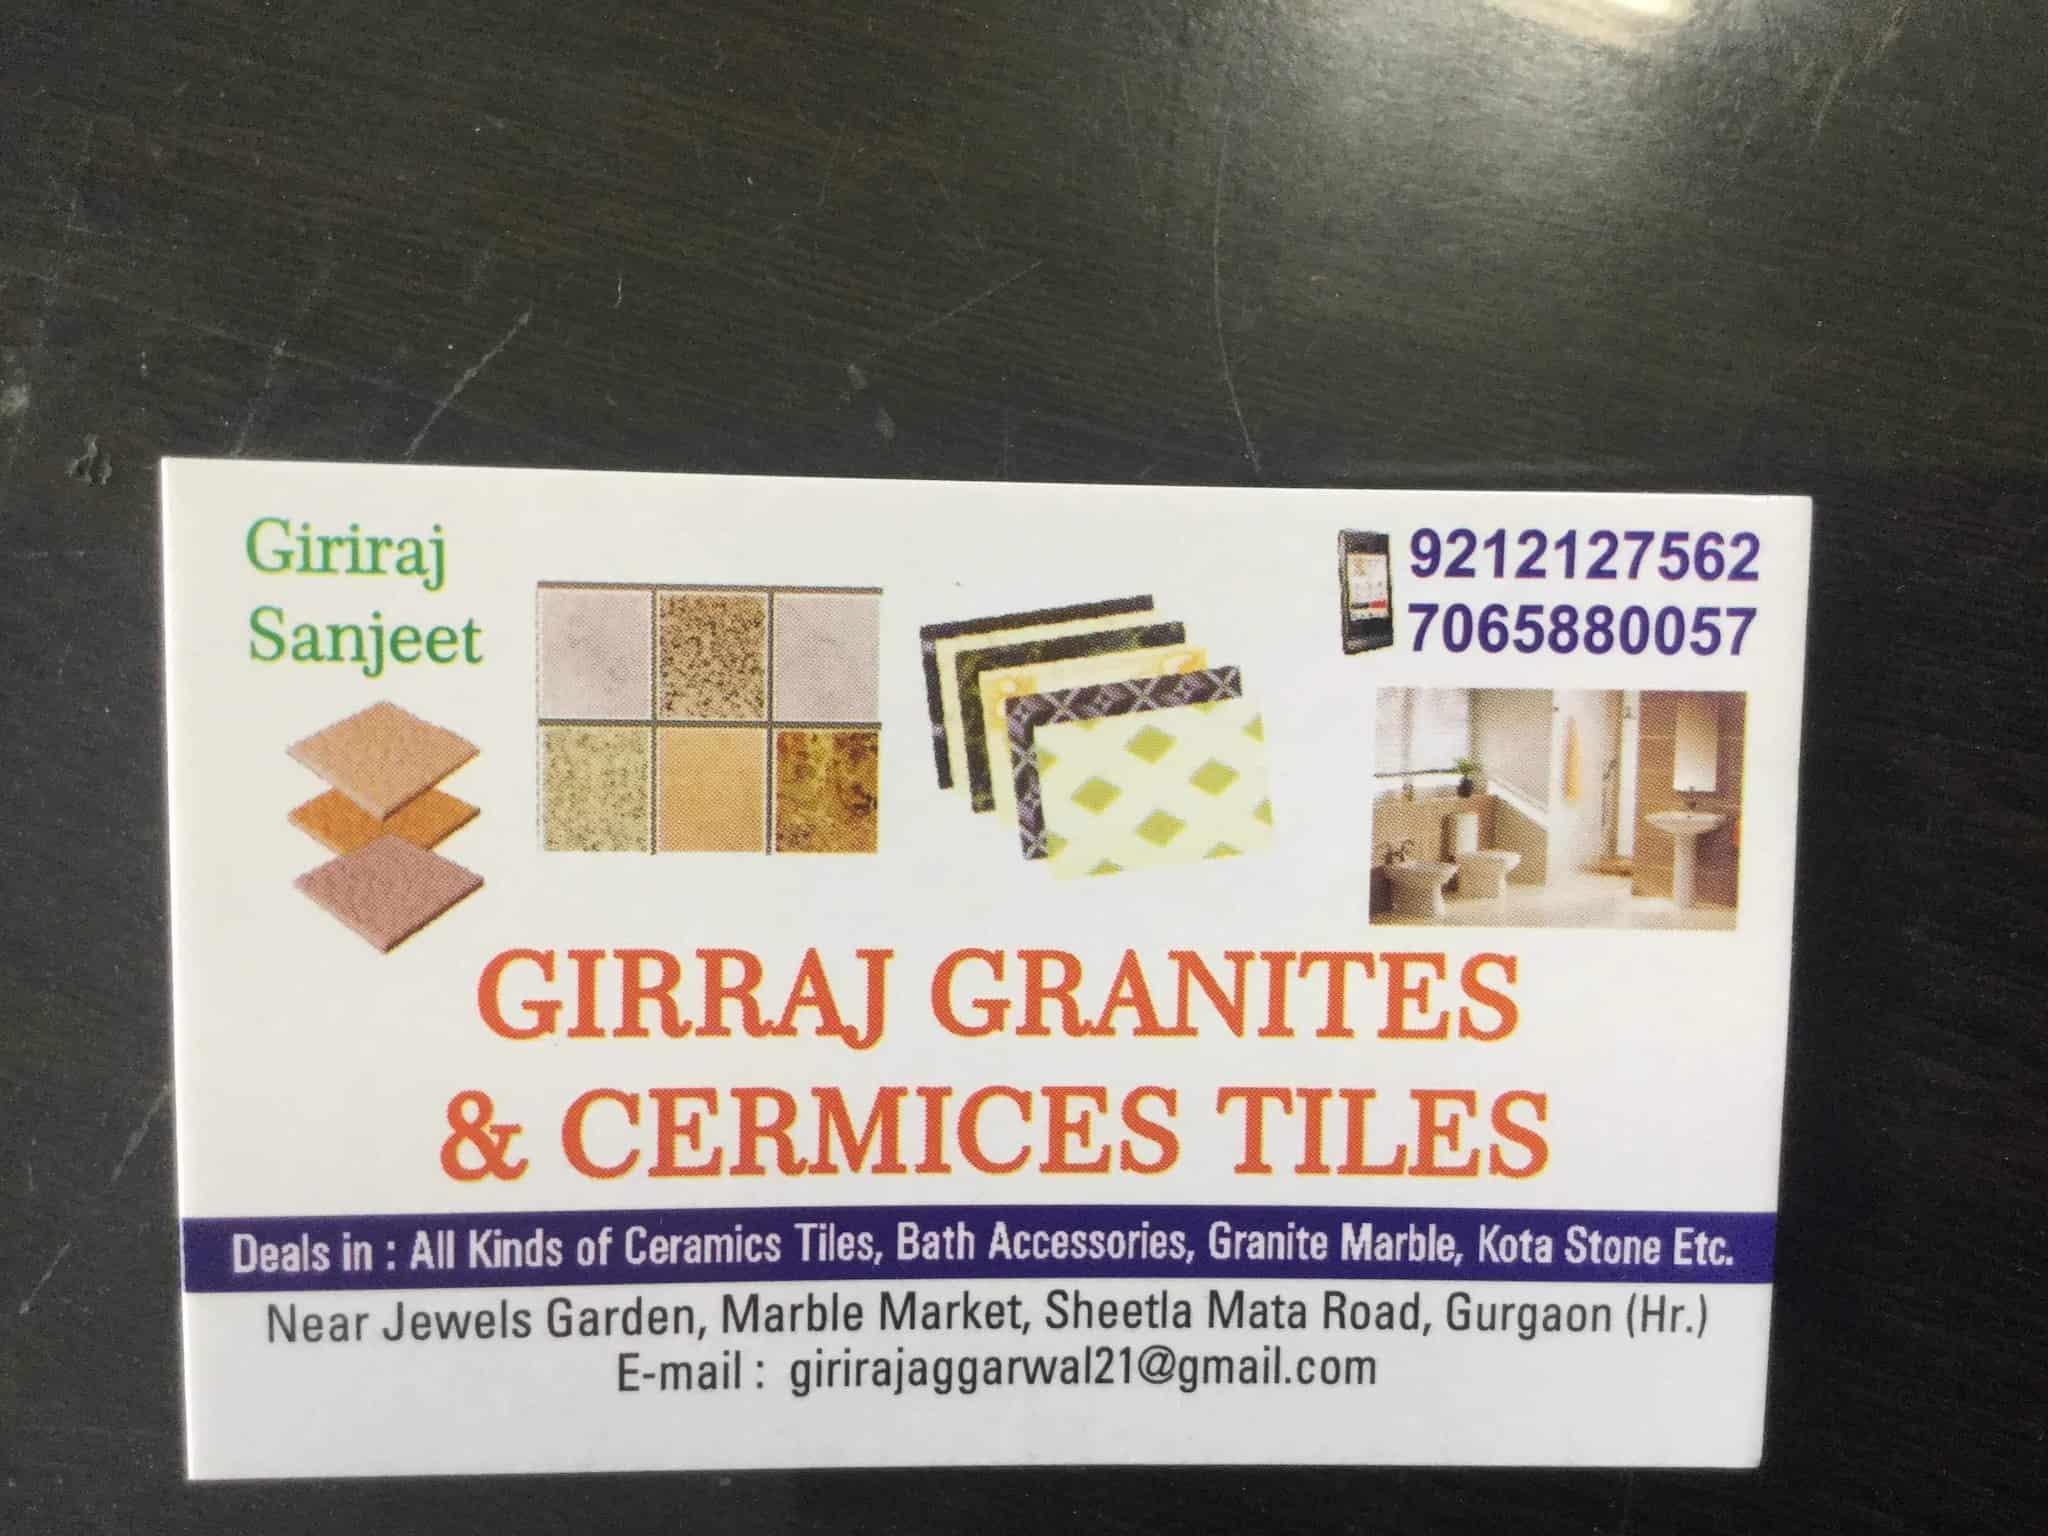 Giriraj Granites Ceramic Tiles Photos Sector 12 Delhi Pictures